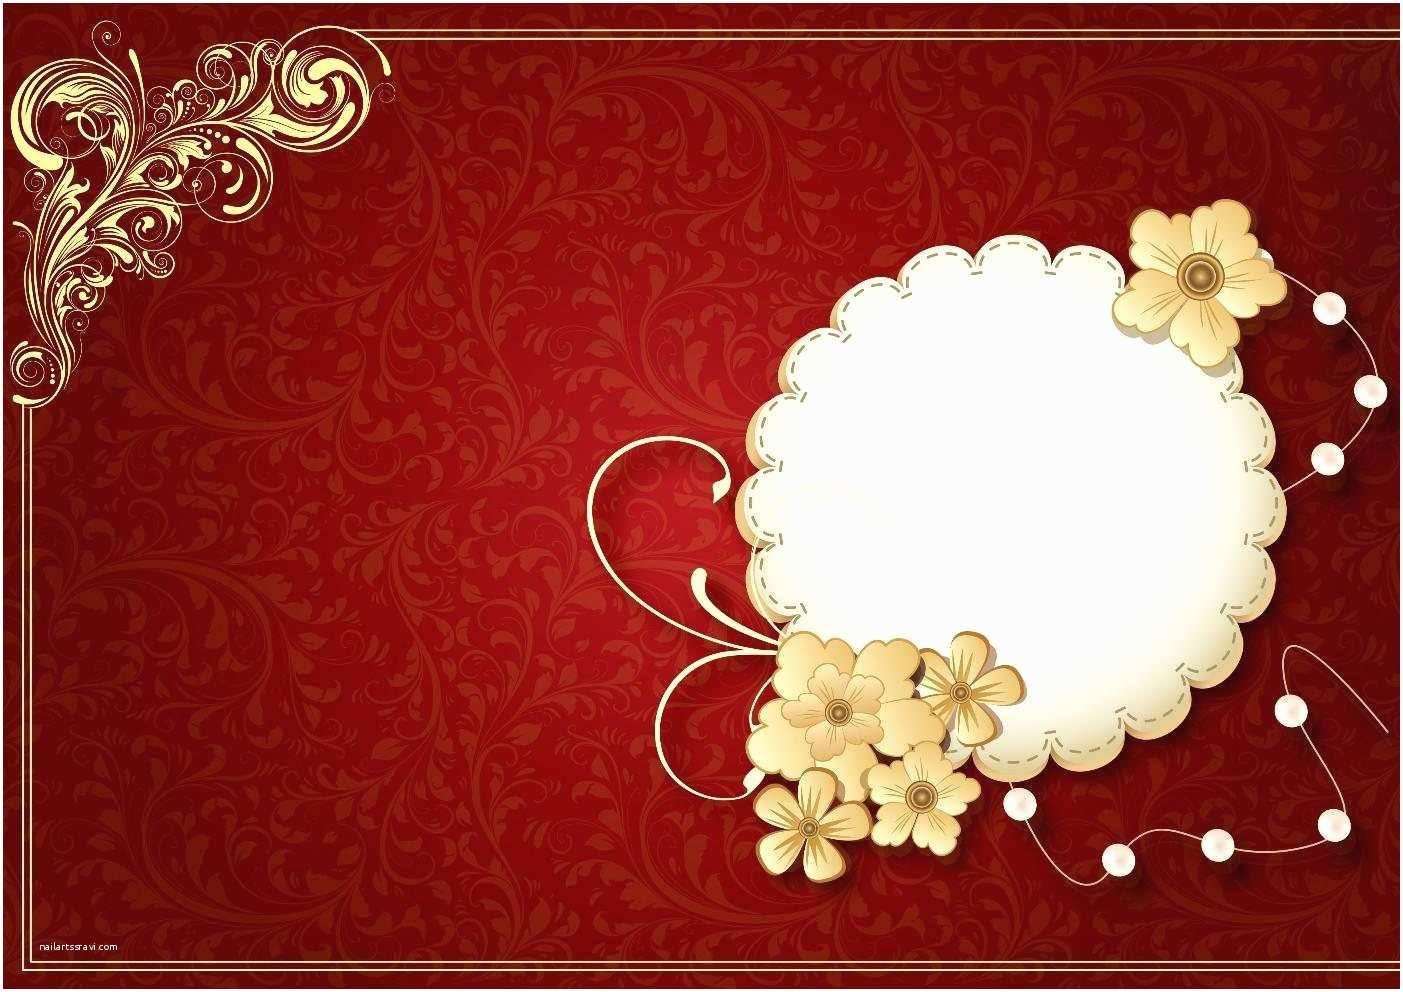 Wedding Invitation Free  Indian Wedding Invitation Background Designs Free